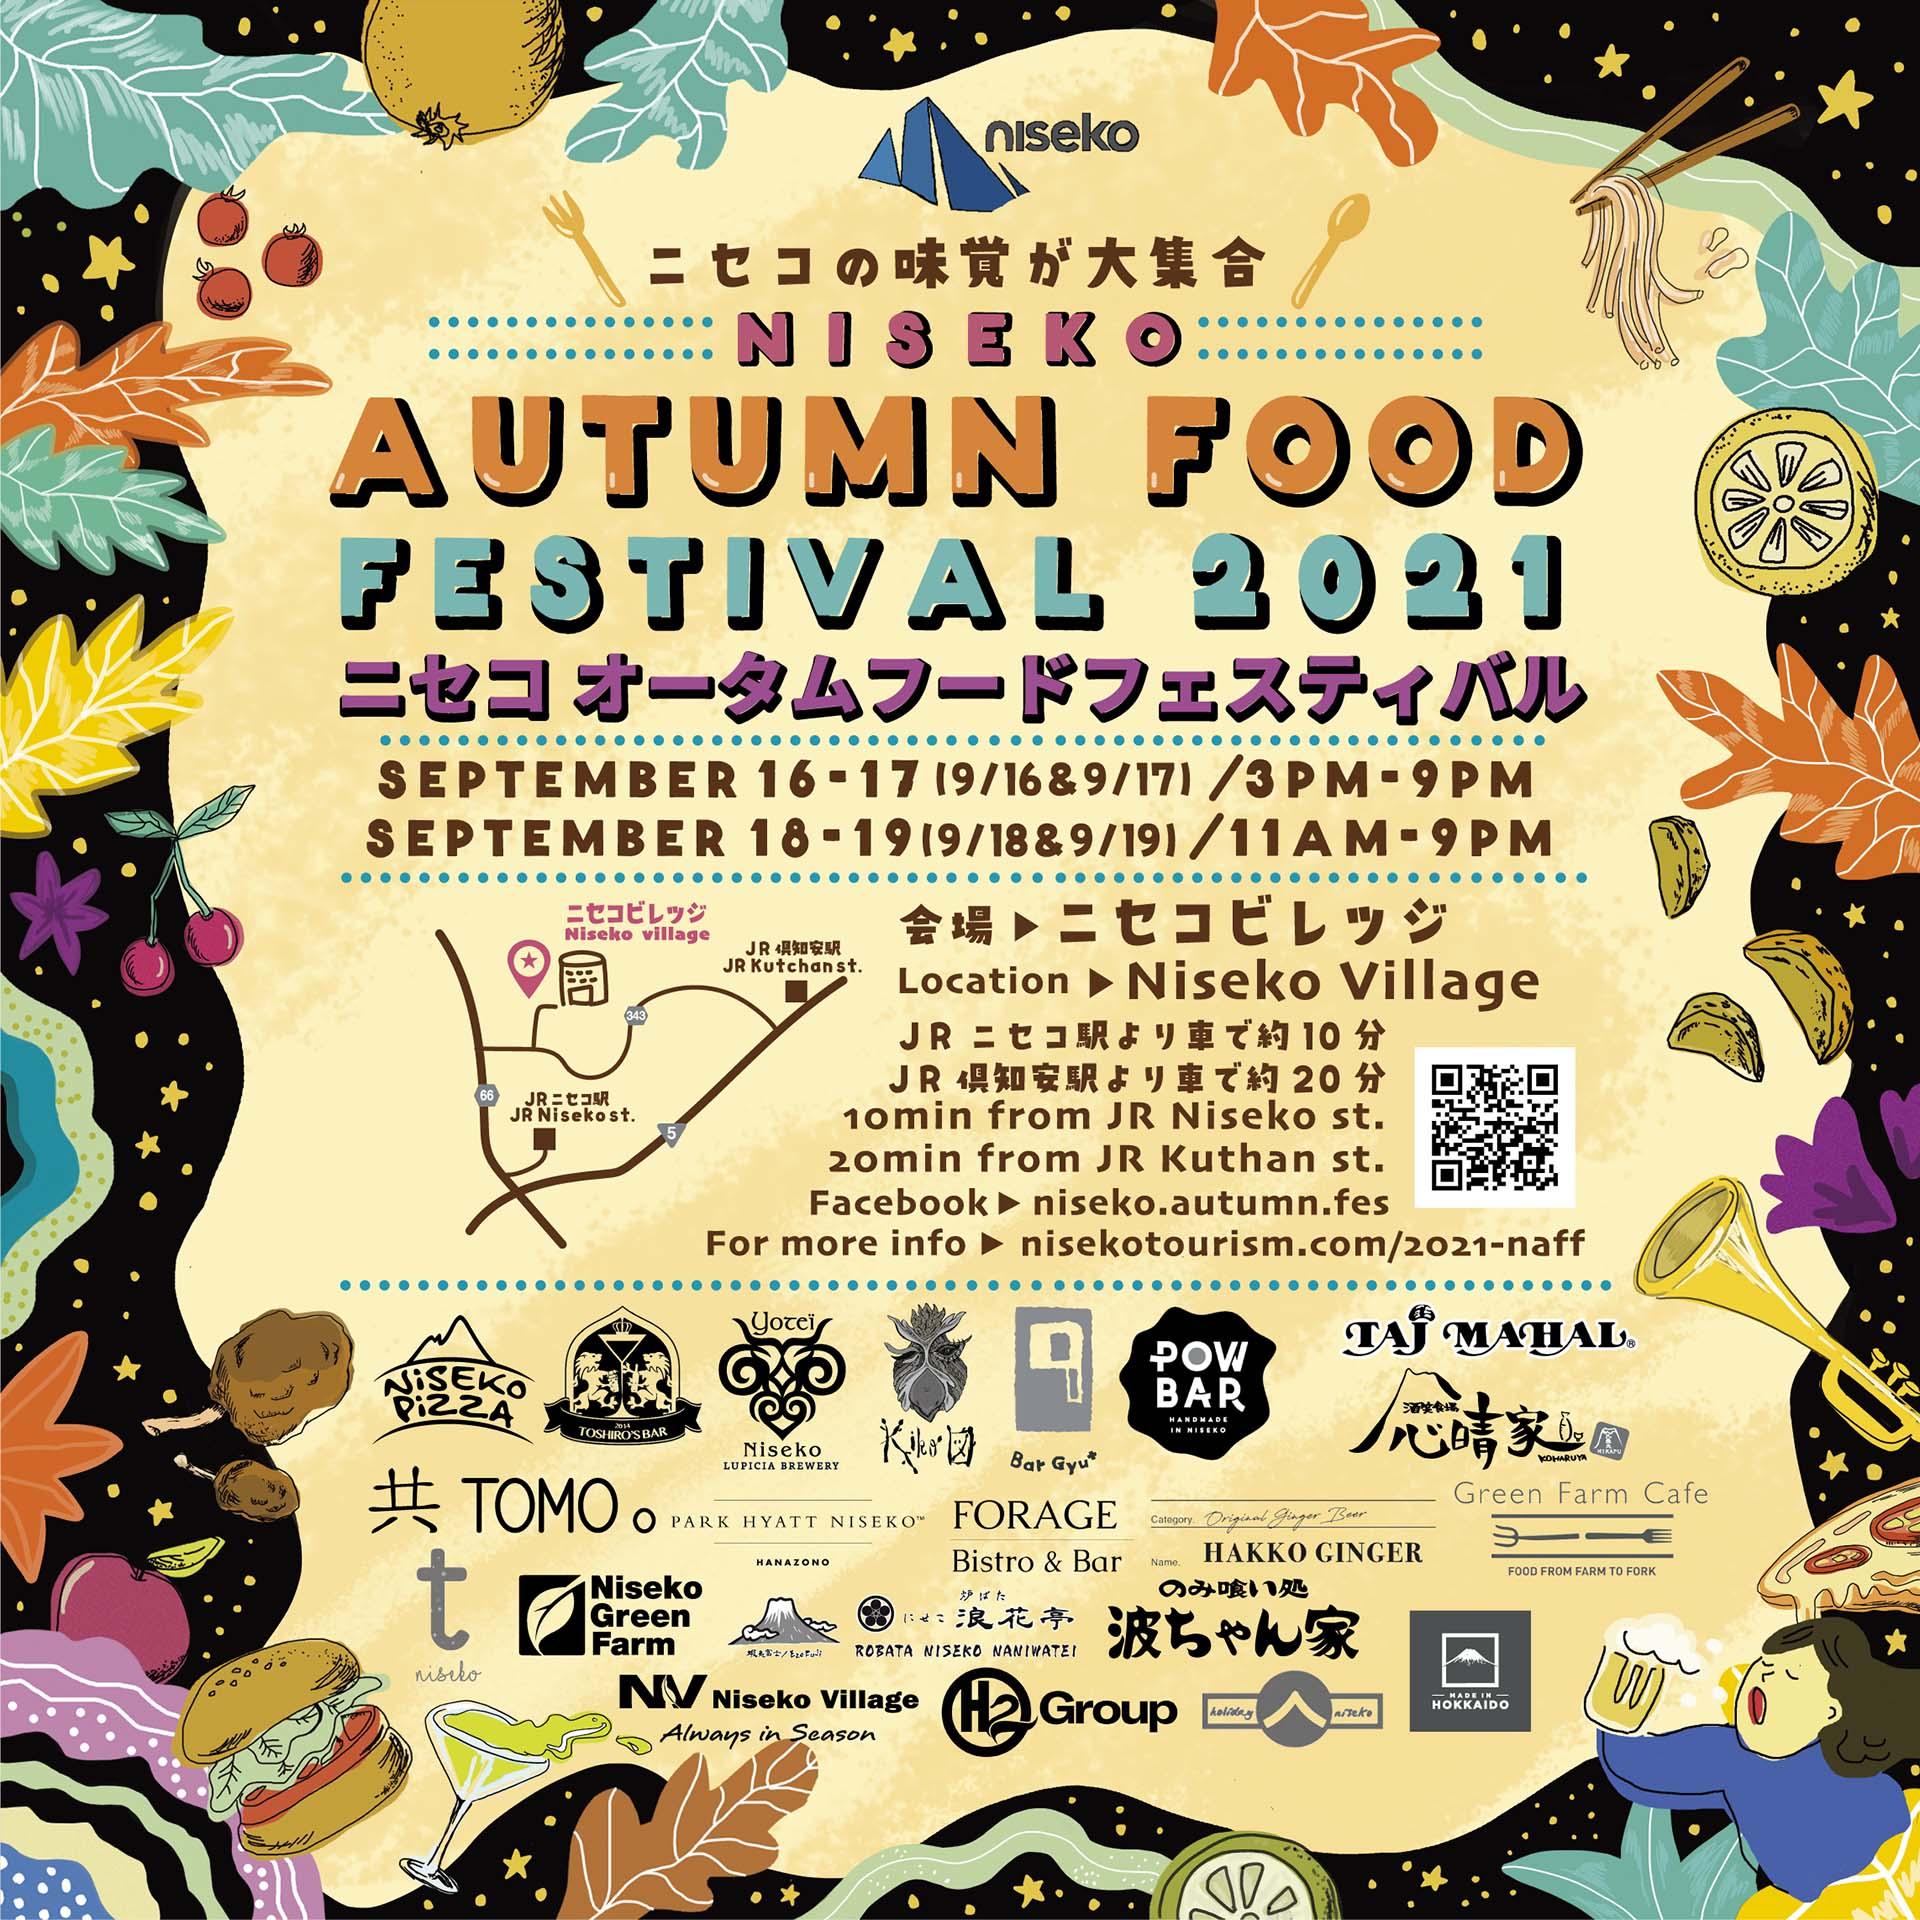 2021 Niseko Autumn Food Festival